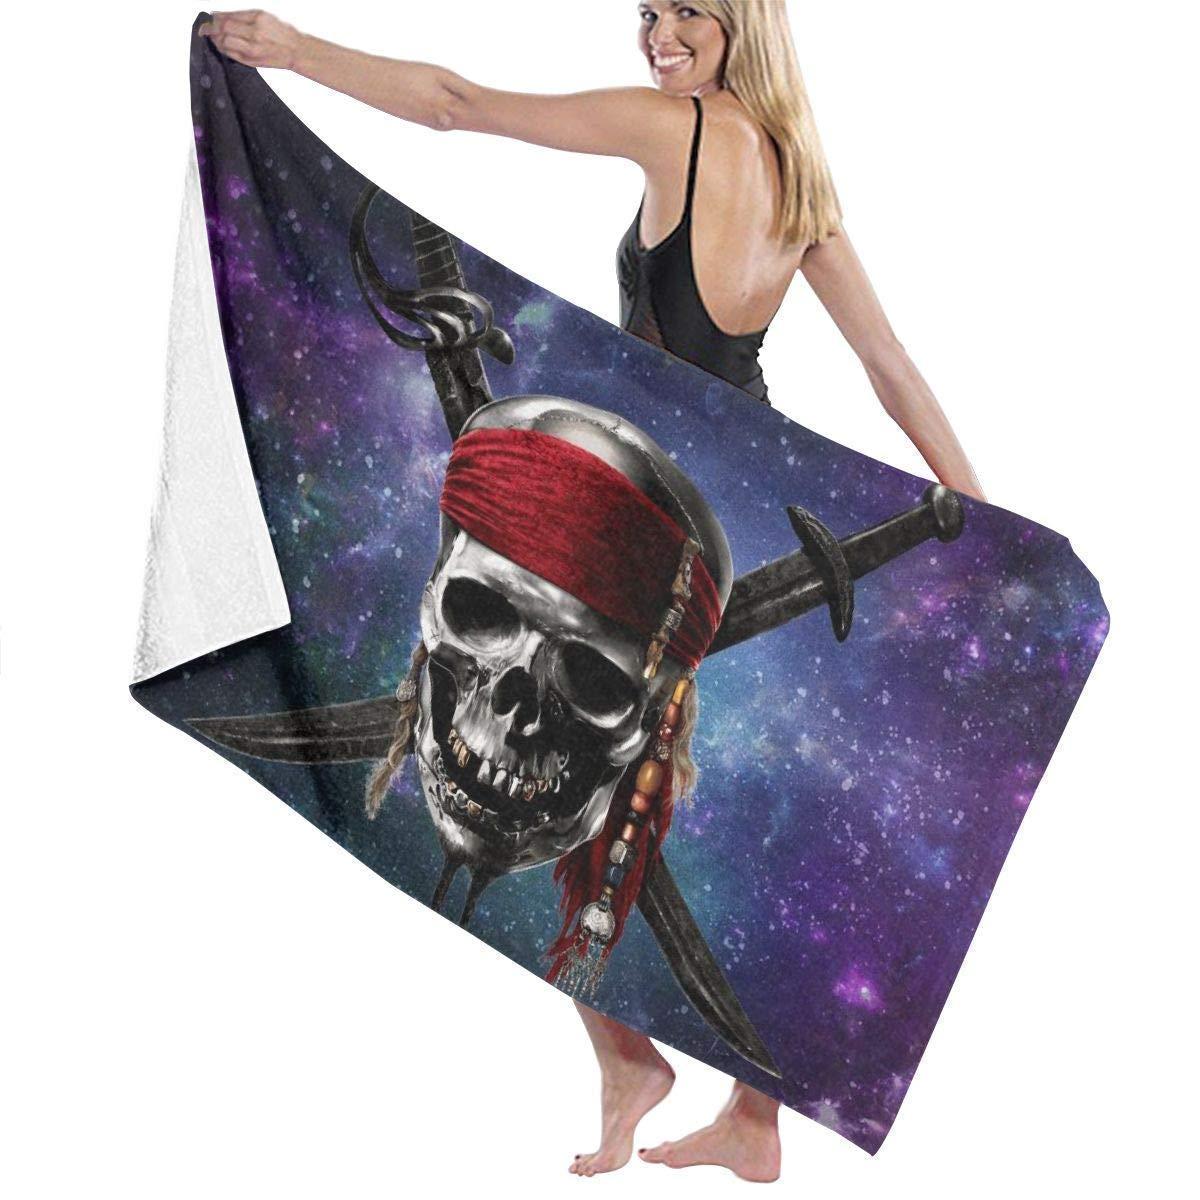 Toalla de ba/ño,Juegos de toallas Pirates of Space Skull Adult Microfiber Beach Towel Oversized 31x51 Inch Fast Dry Eco-Friendly Multipurpose Use Pool Towel for Women Men Hotel Home Ideas decoratio